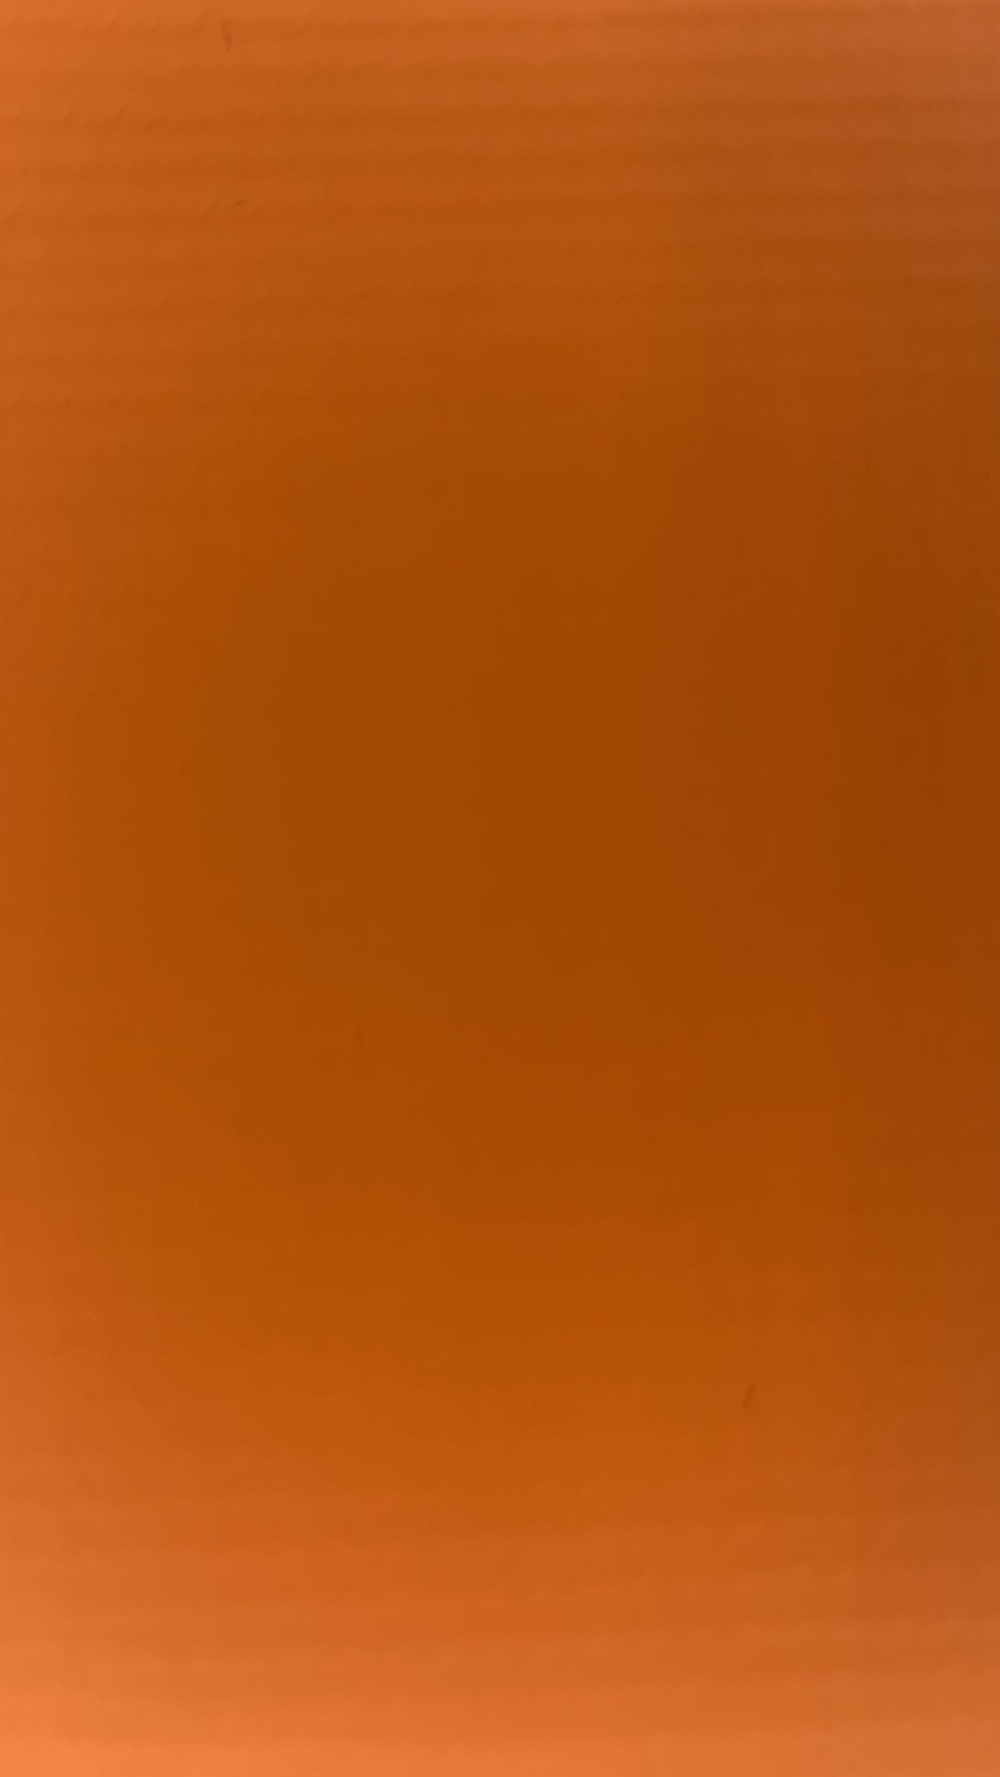 Lona Vinilona Df Fosca Laranja S-101 1,45mt X 1,0mt